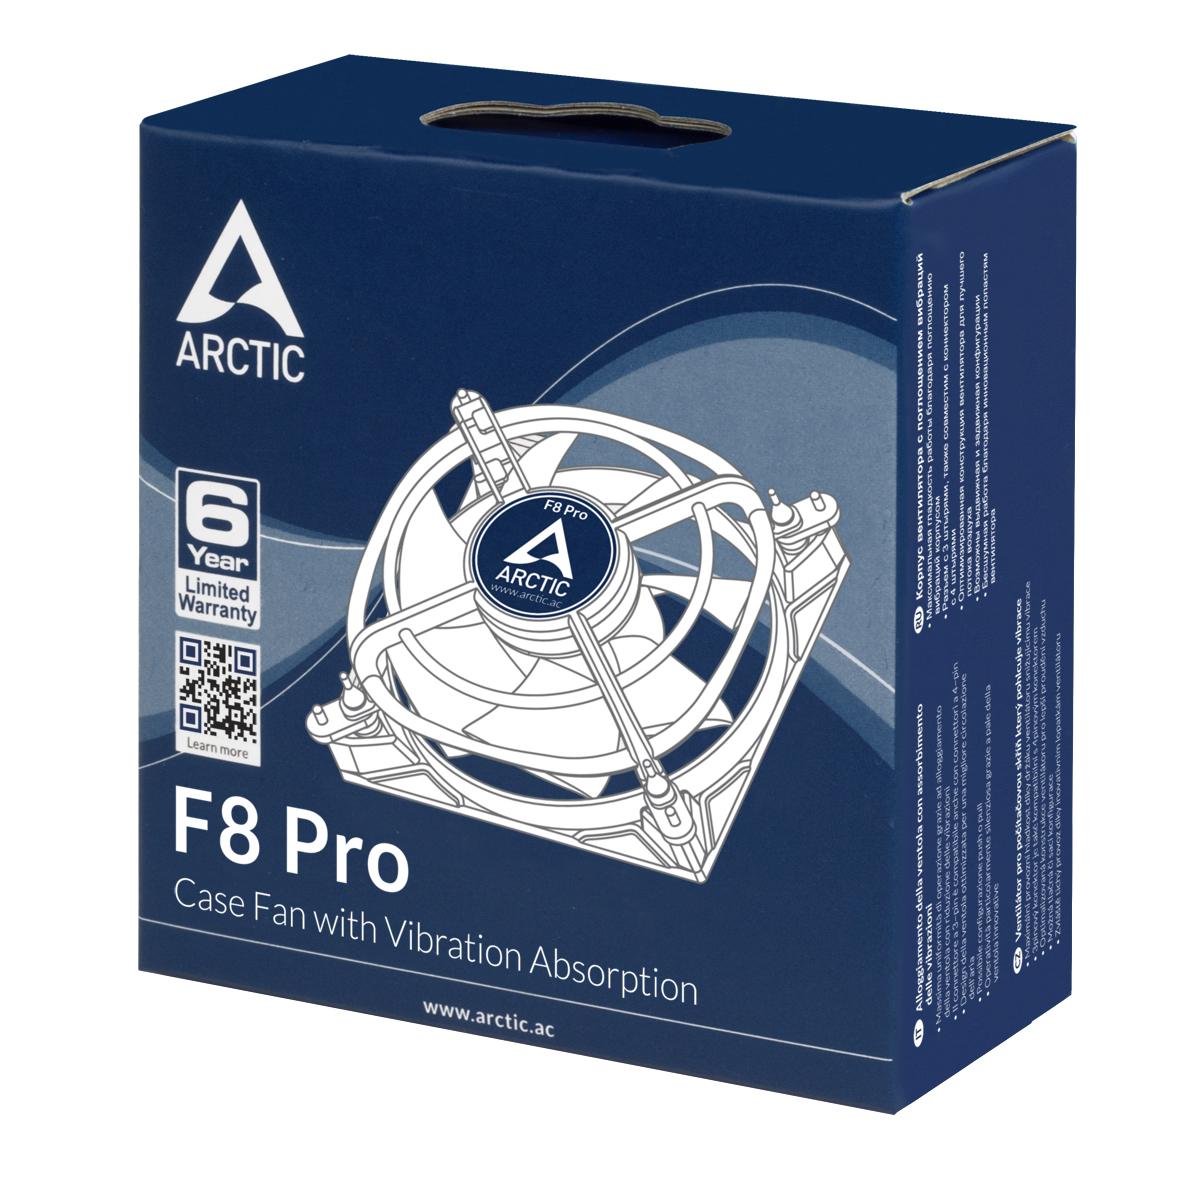 F8 Pro